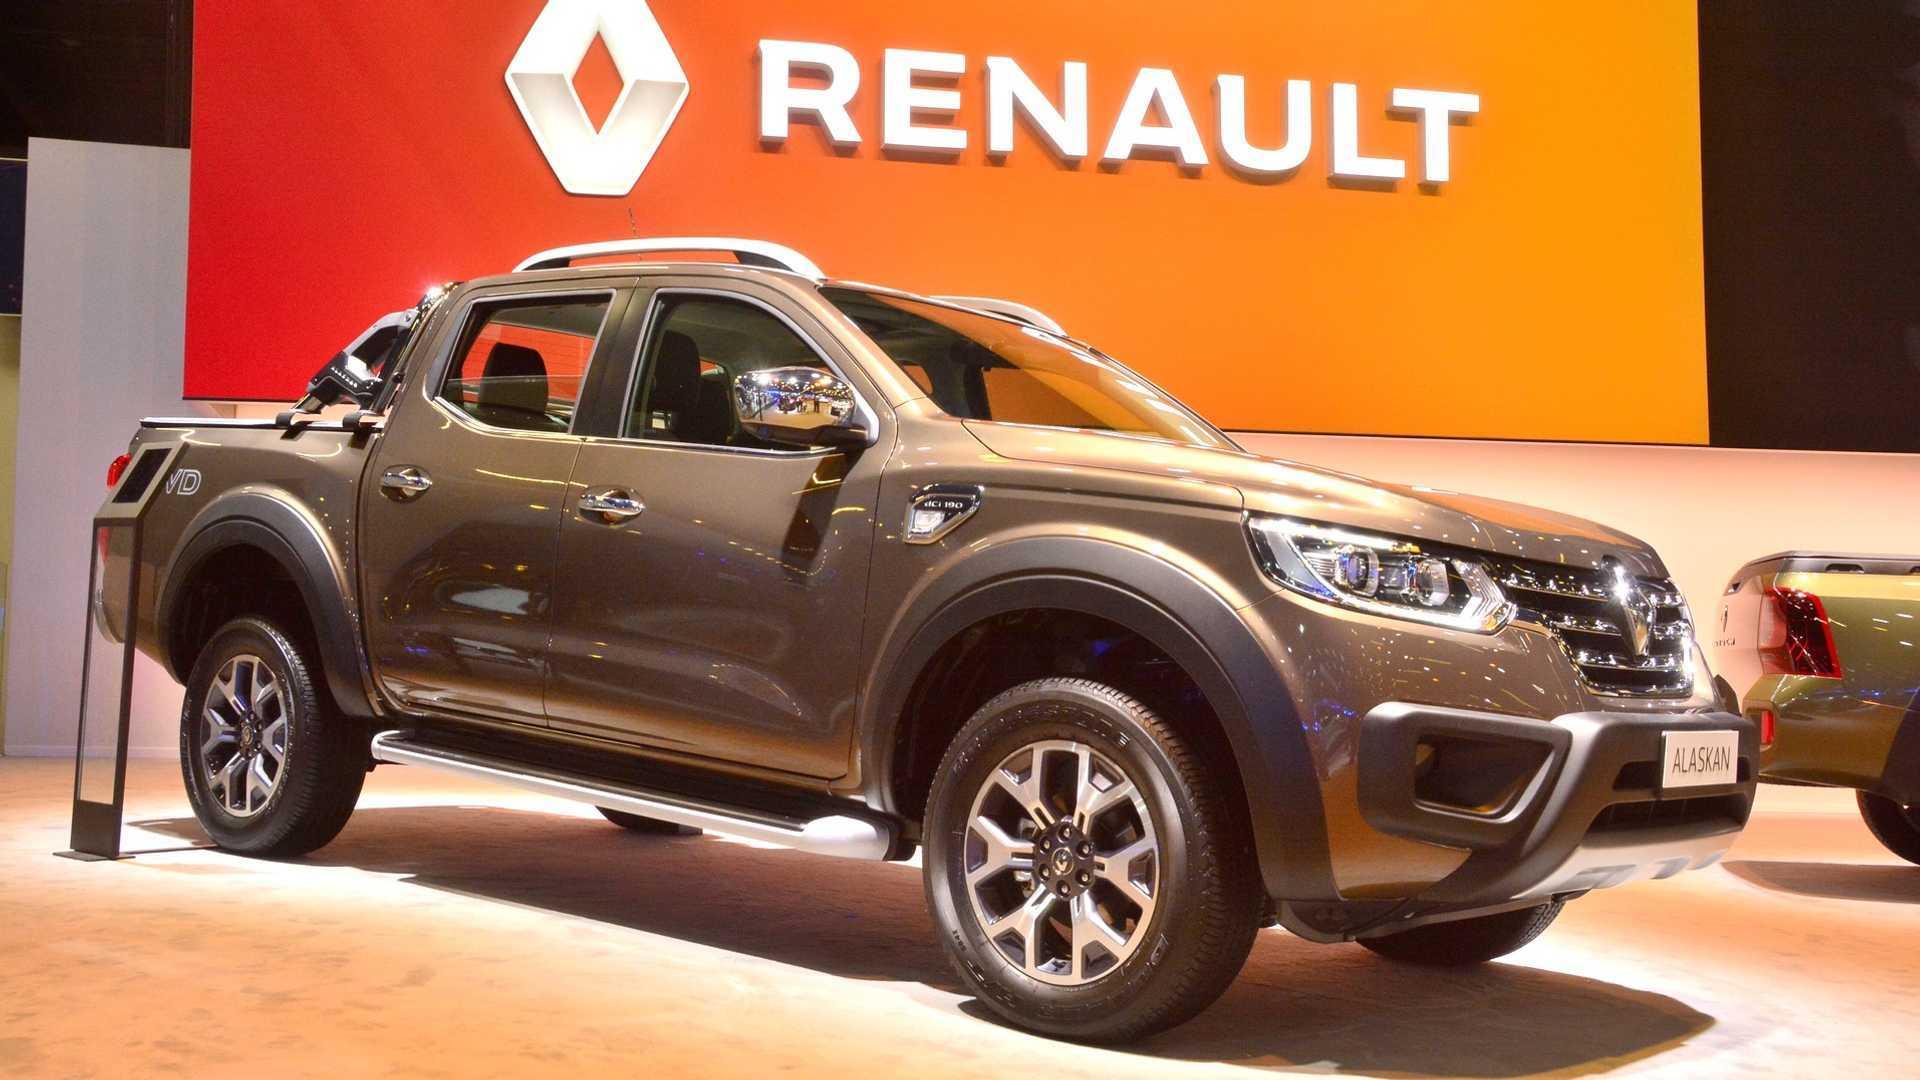 Forum gratis : Compra e venda engenharia Carro Renault-alaskan